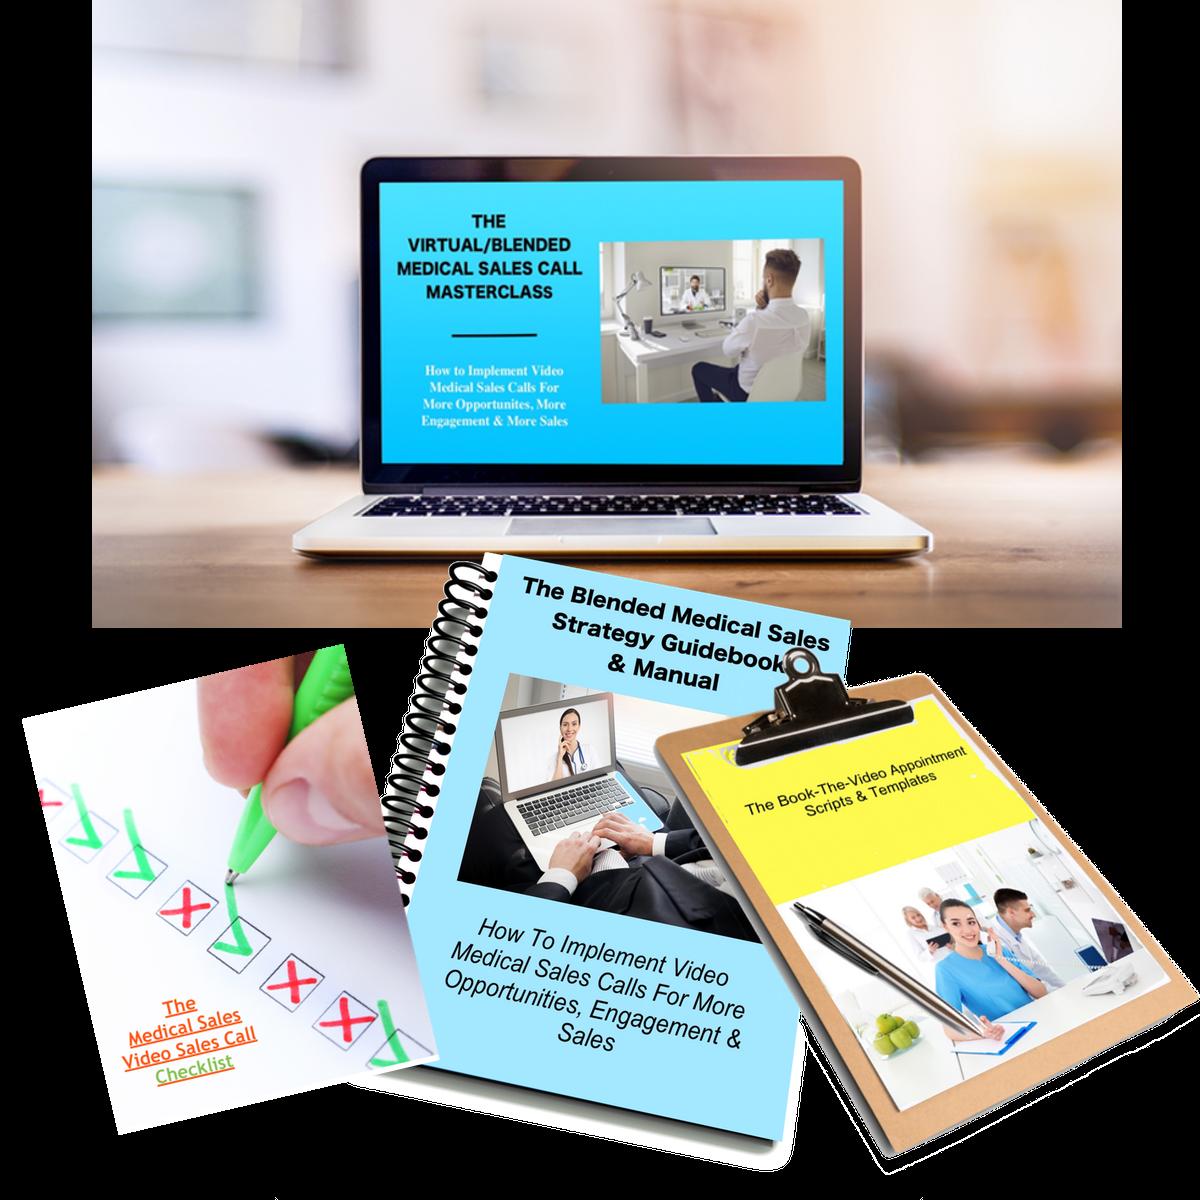 enroll in the virutal / blended medical sales call masterclass